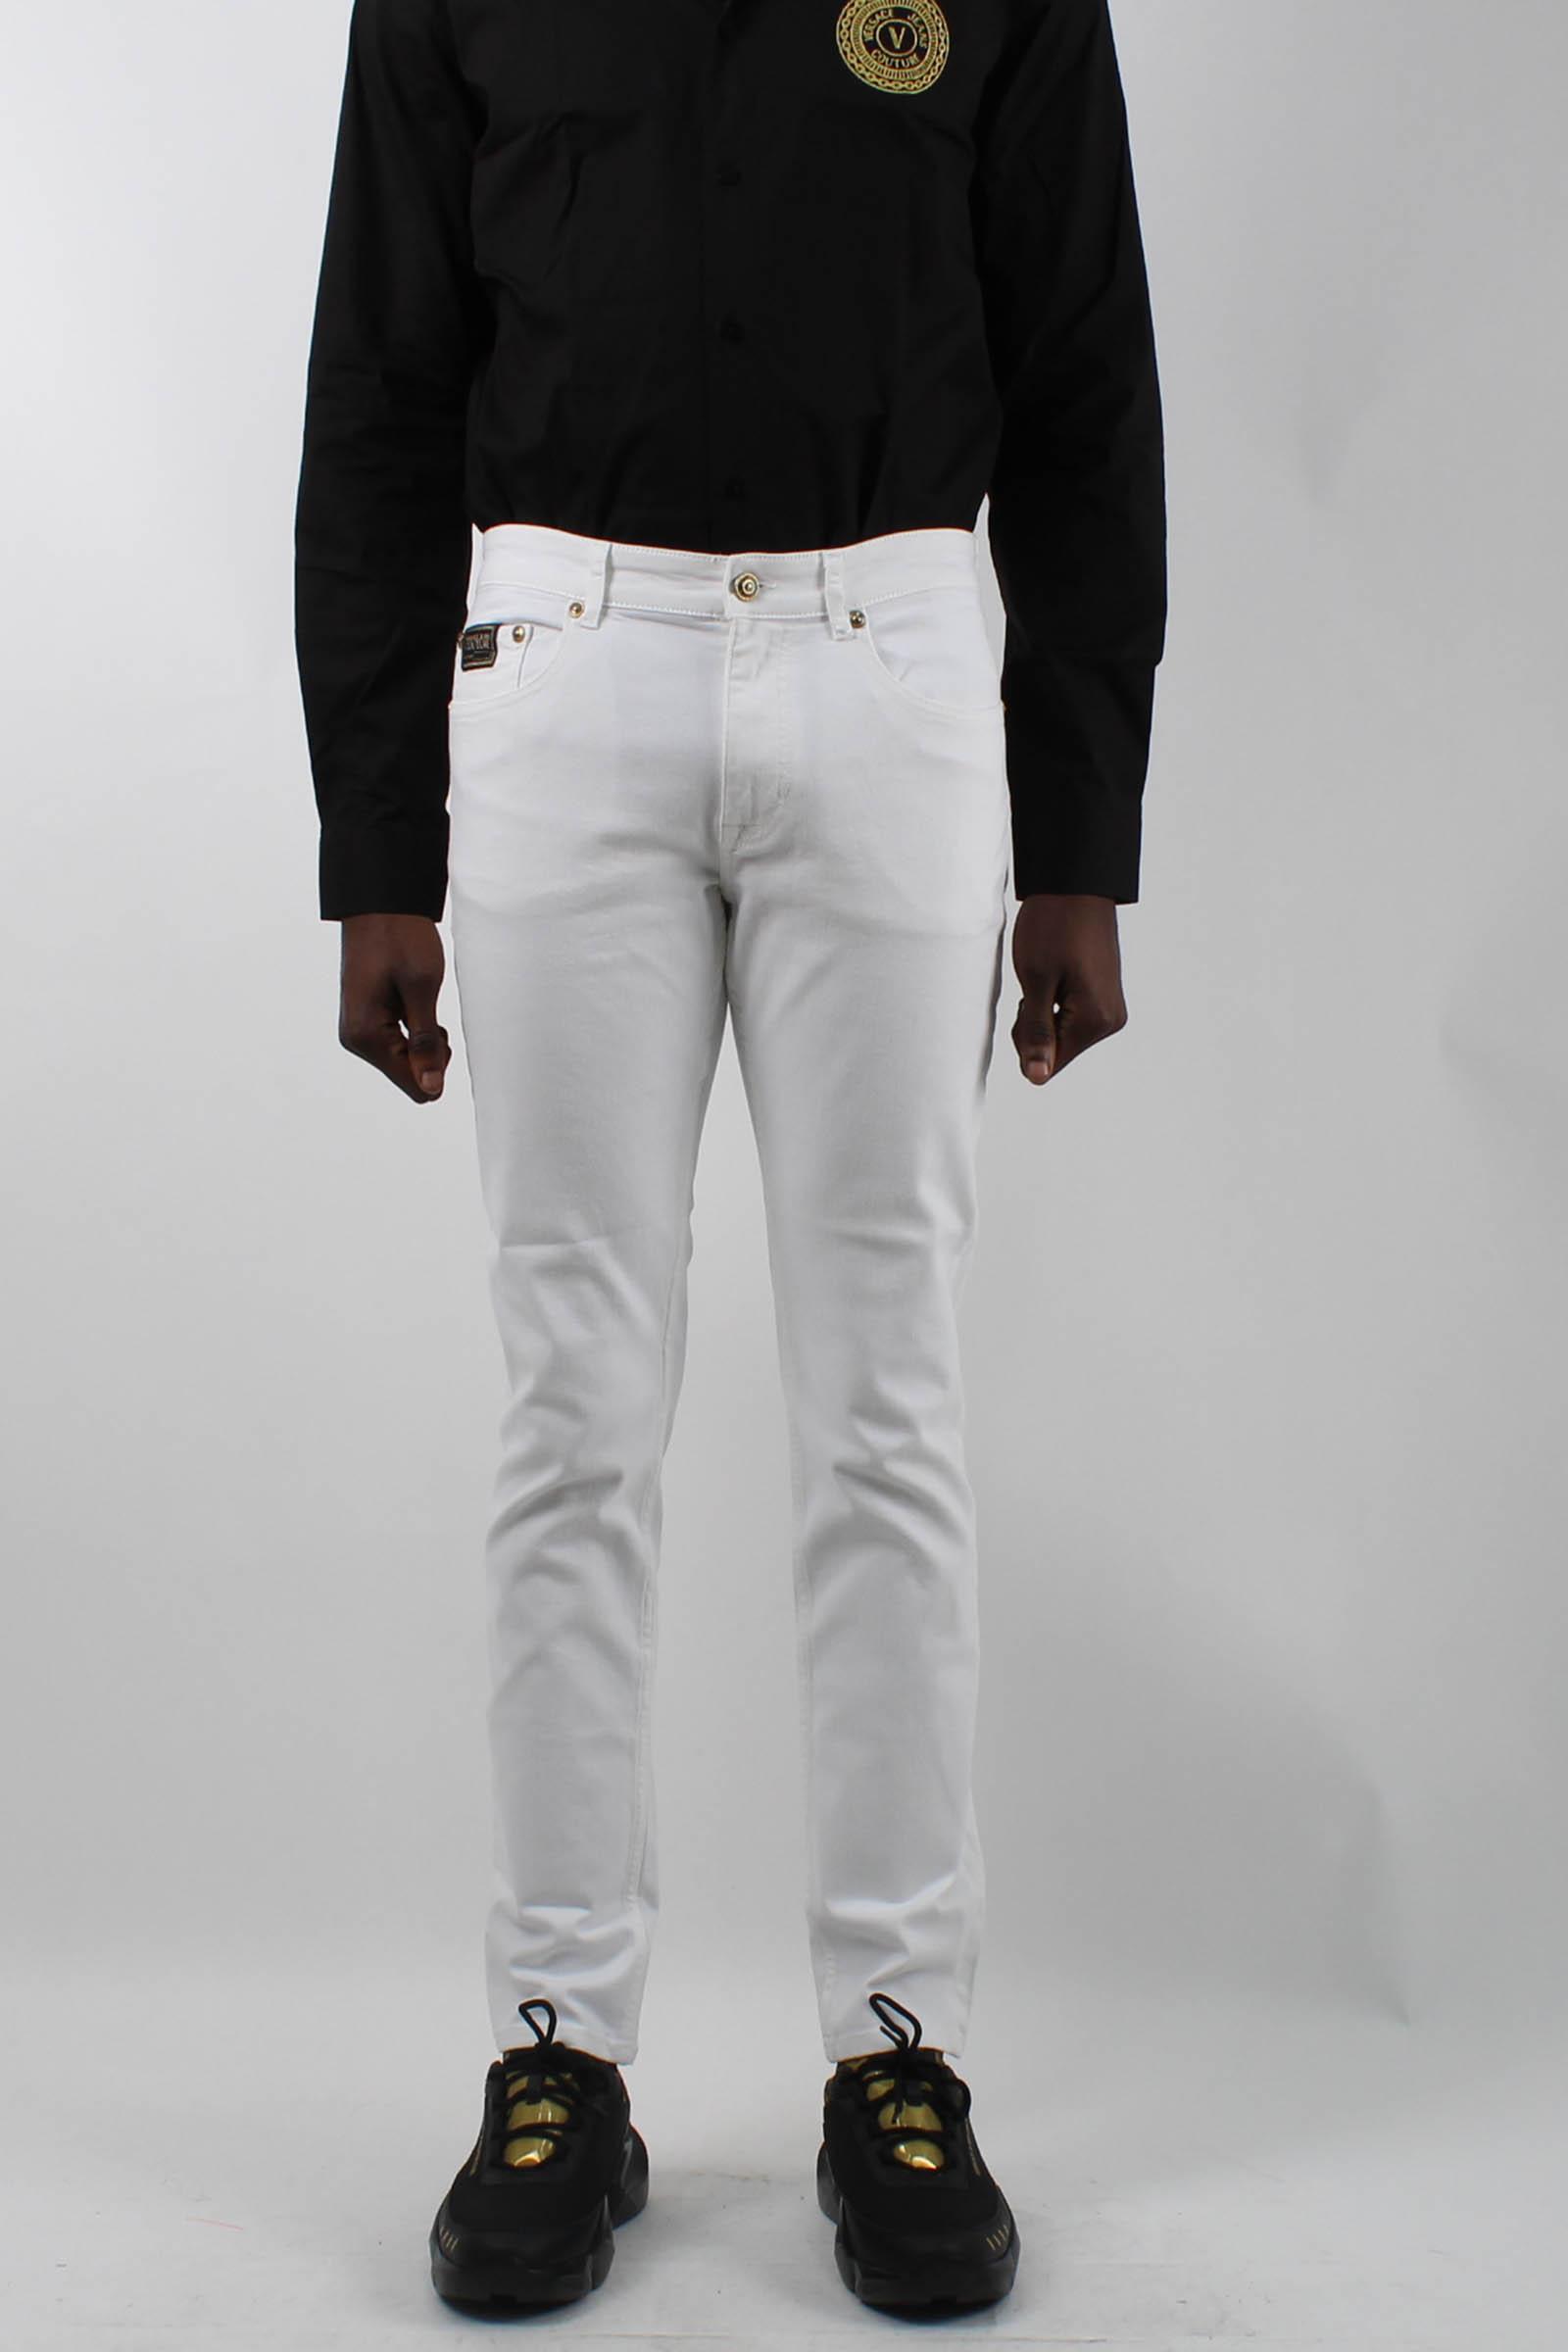 VERSACE JEANS | Jeans | A2 GWA0S5 60501003